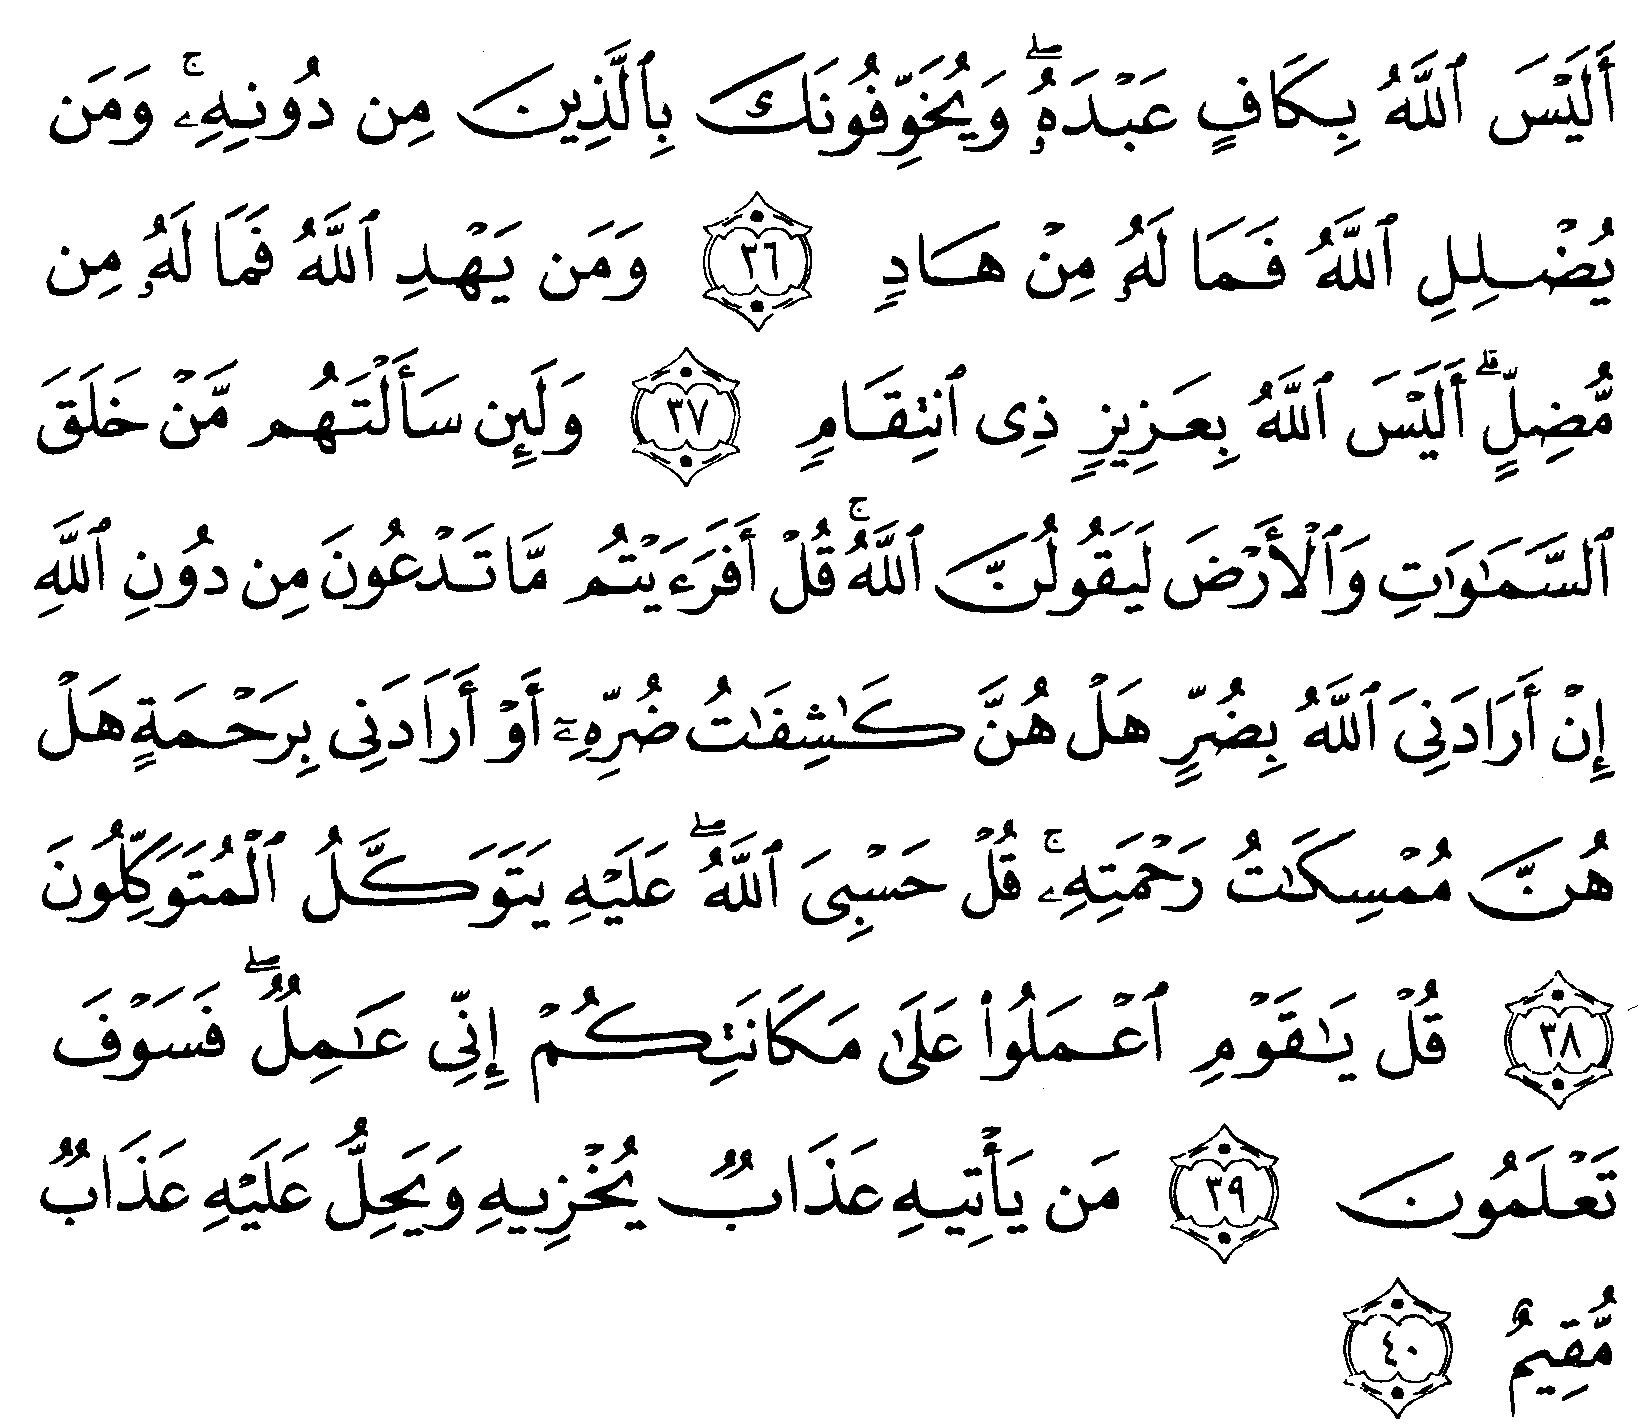 Tafsir Ibu Katsir Surah Az Zumar 9 Alquranmulia